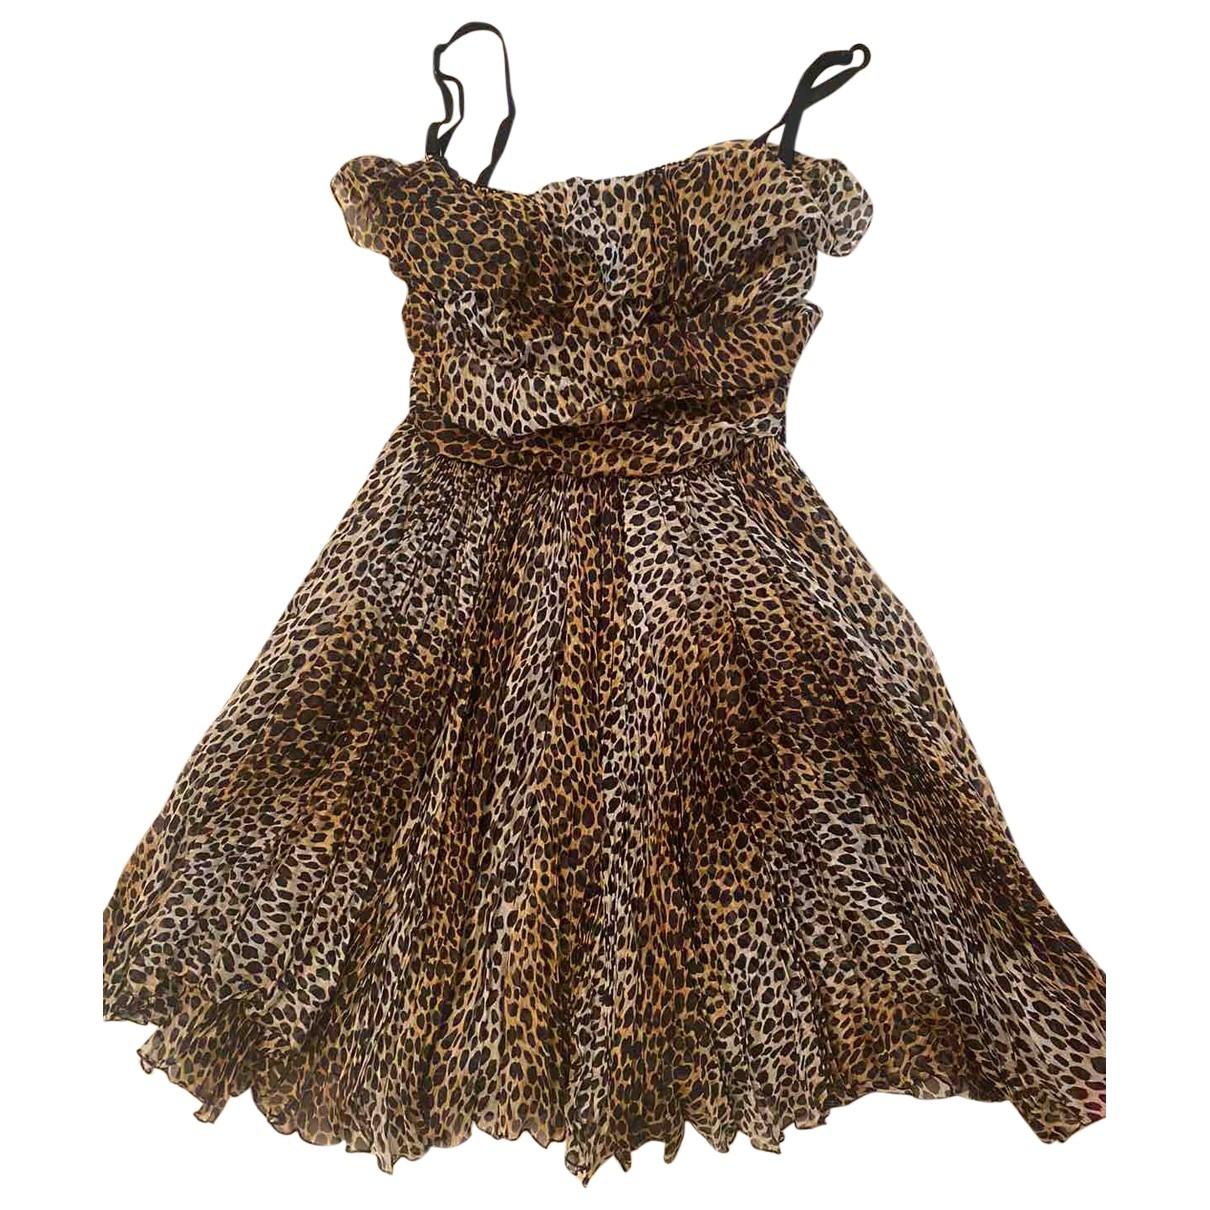 D&g \N Silk dress for Women 38 IT